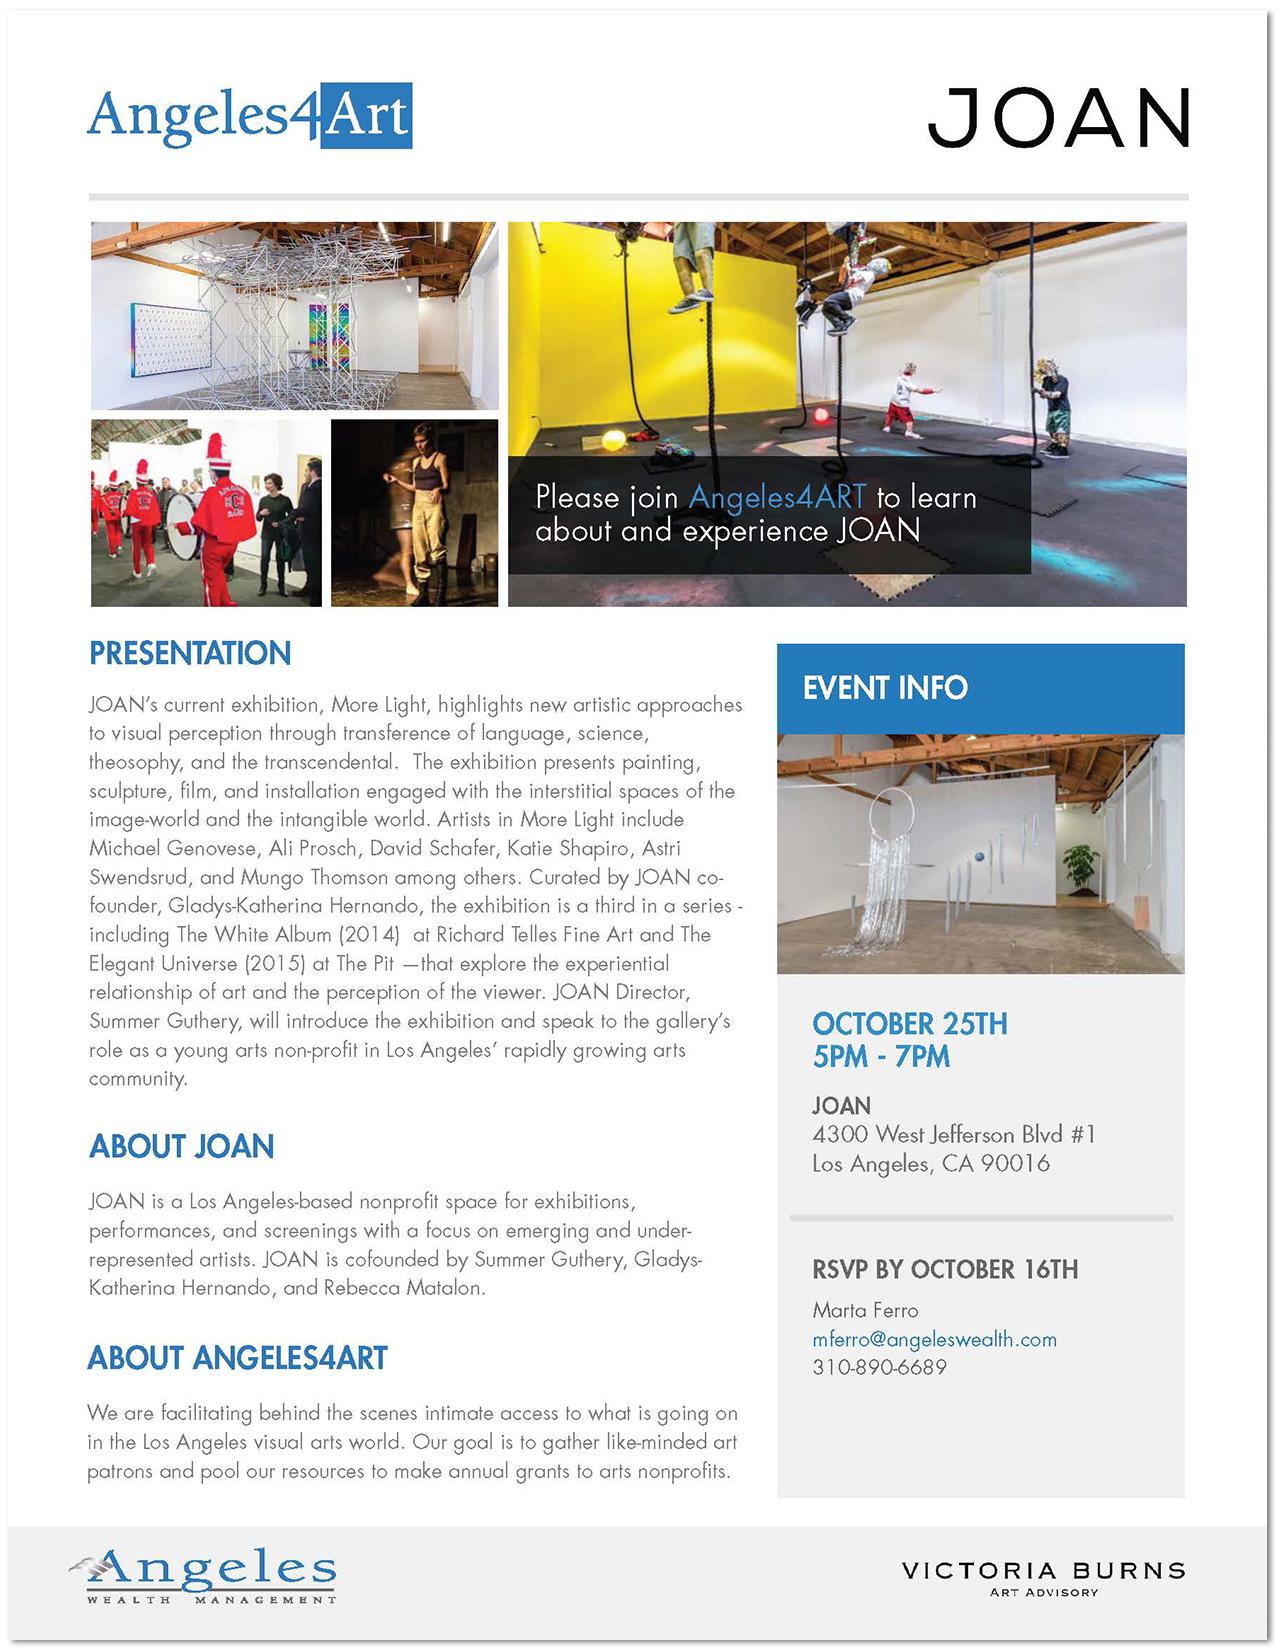 Angeles Art Fund Invites_older2.jpg